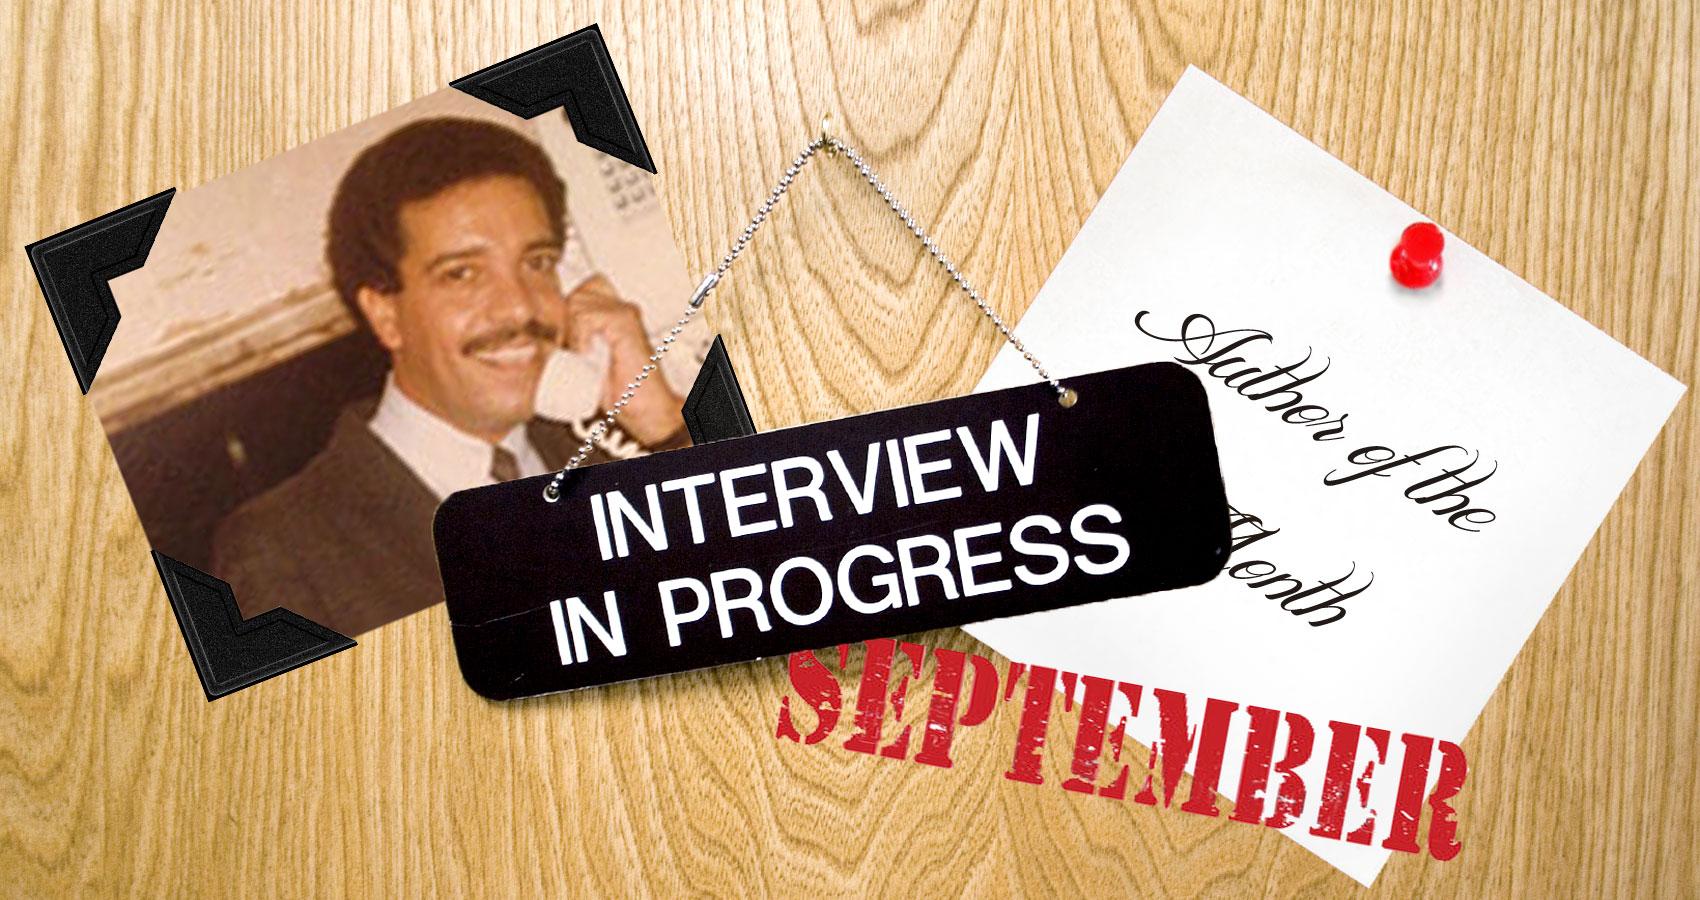 Interview with the author José A. Gómez at Spillwords.com